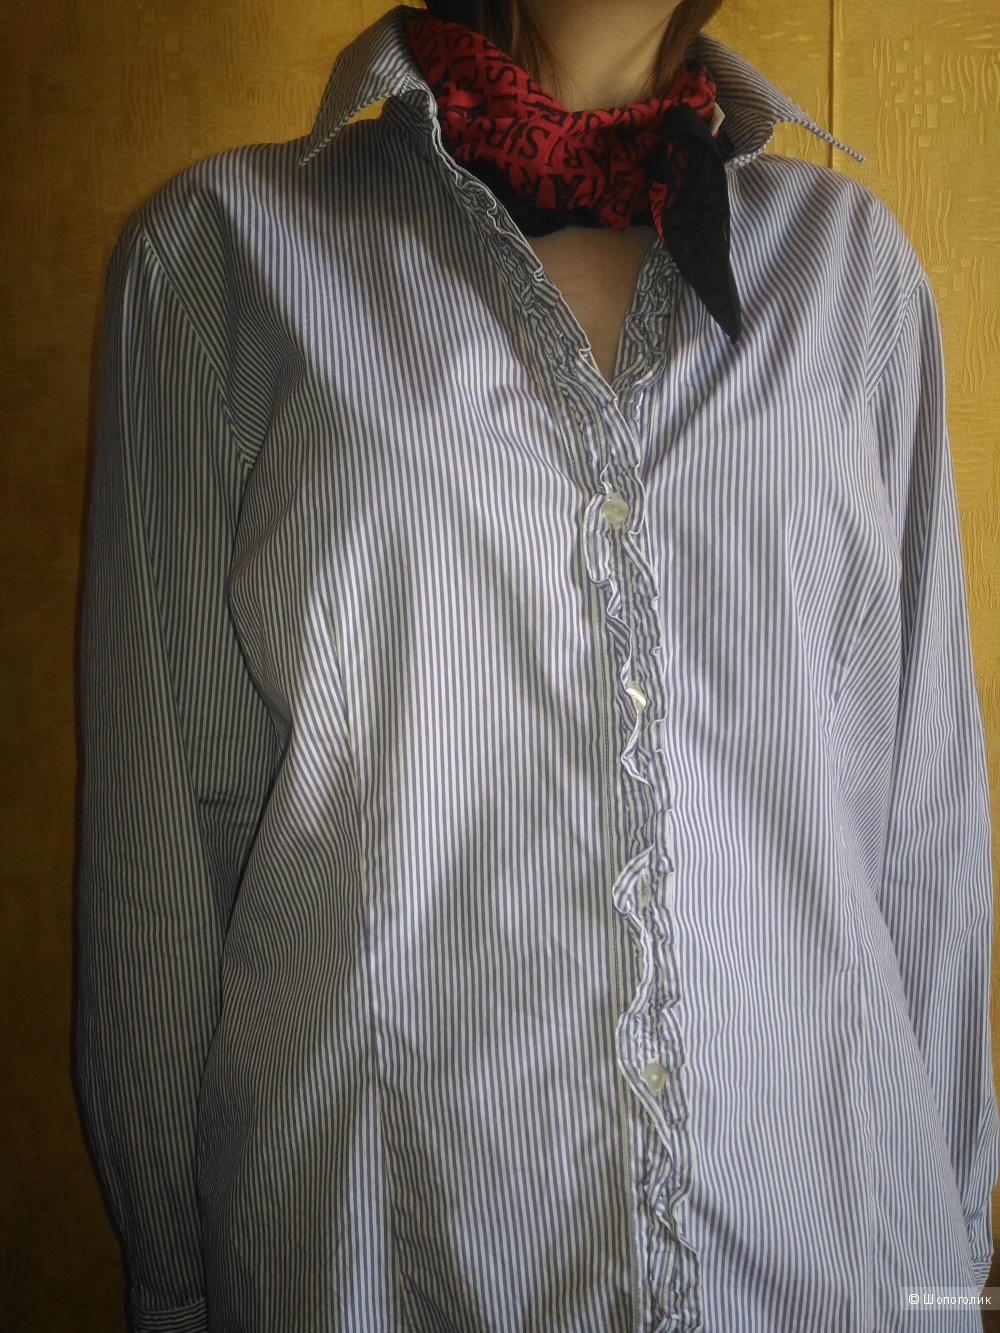 Рубашка,TOMMY HILFIGER,44-46